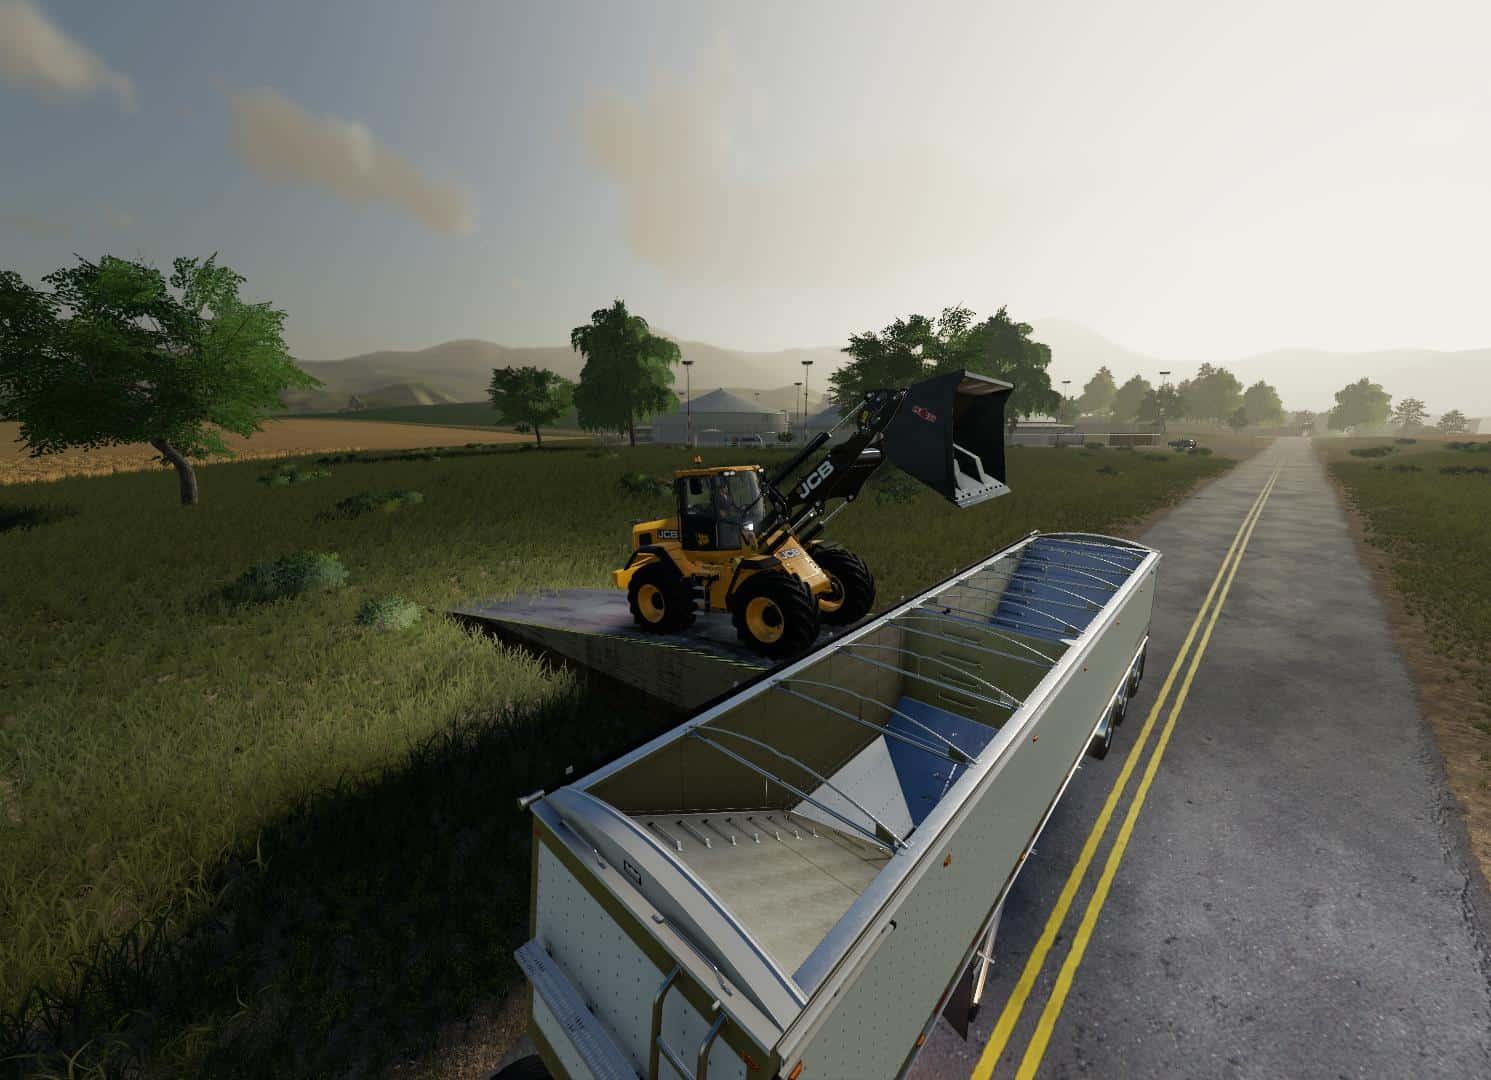 Ramp v1 0 0 0 Mod - Farming Simulator 19 Mod / FS19